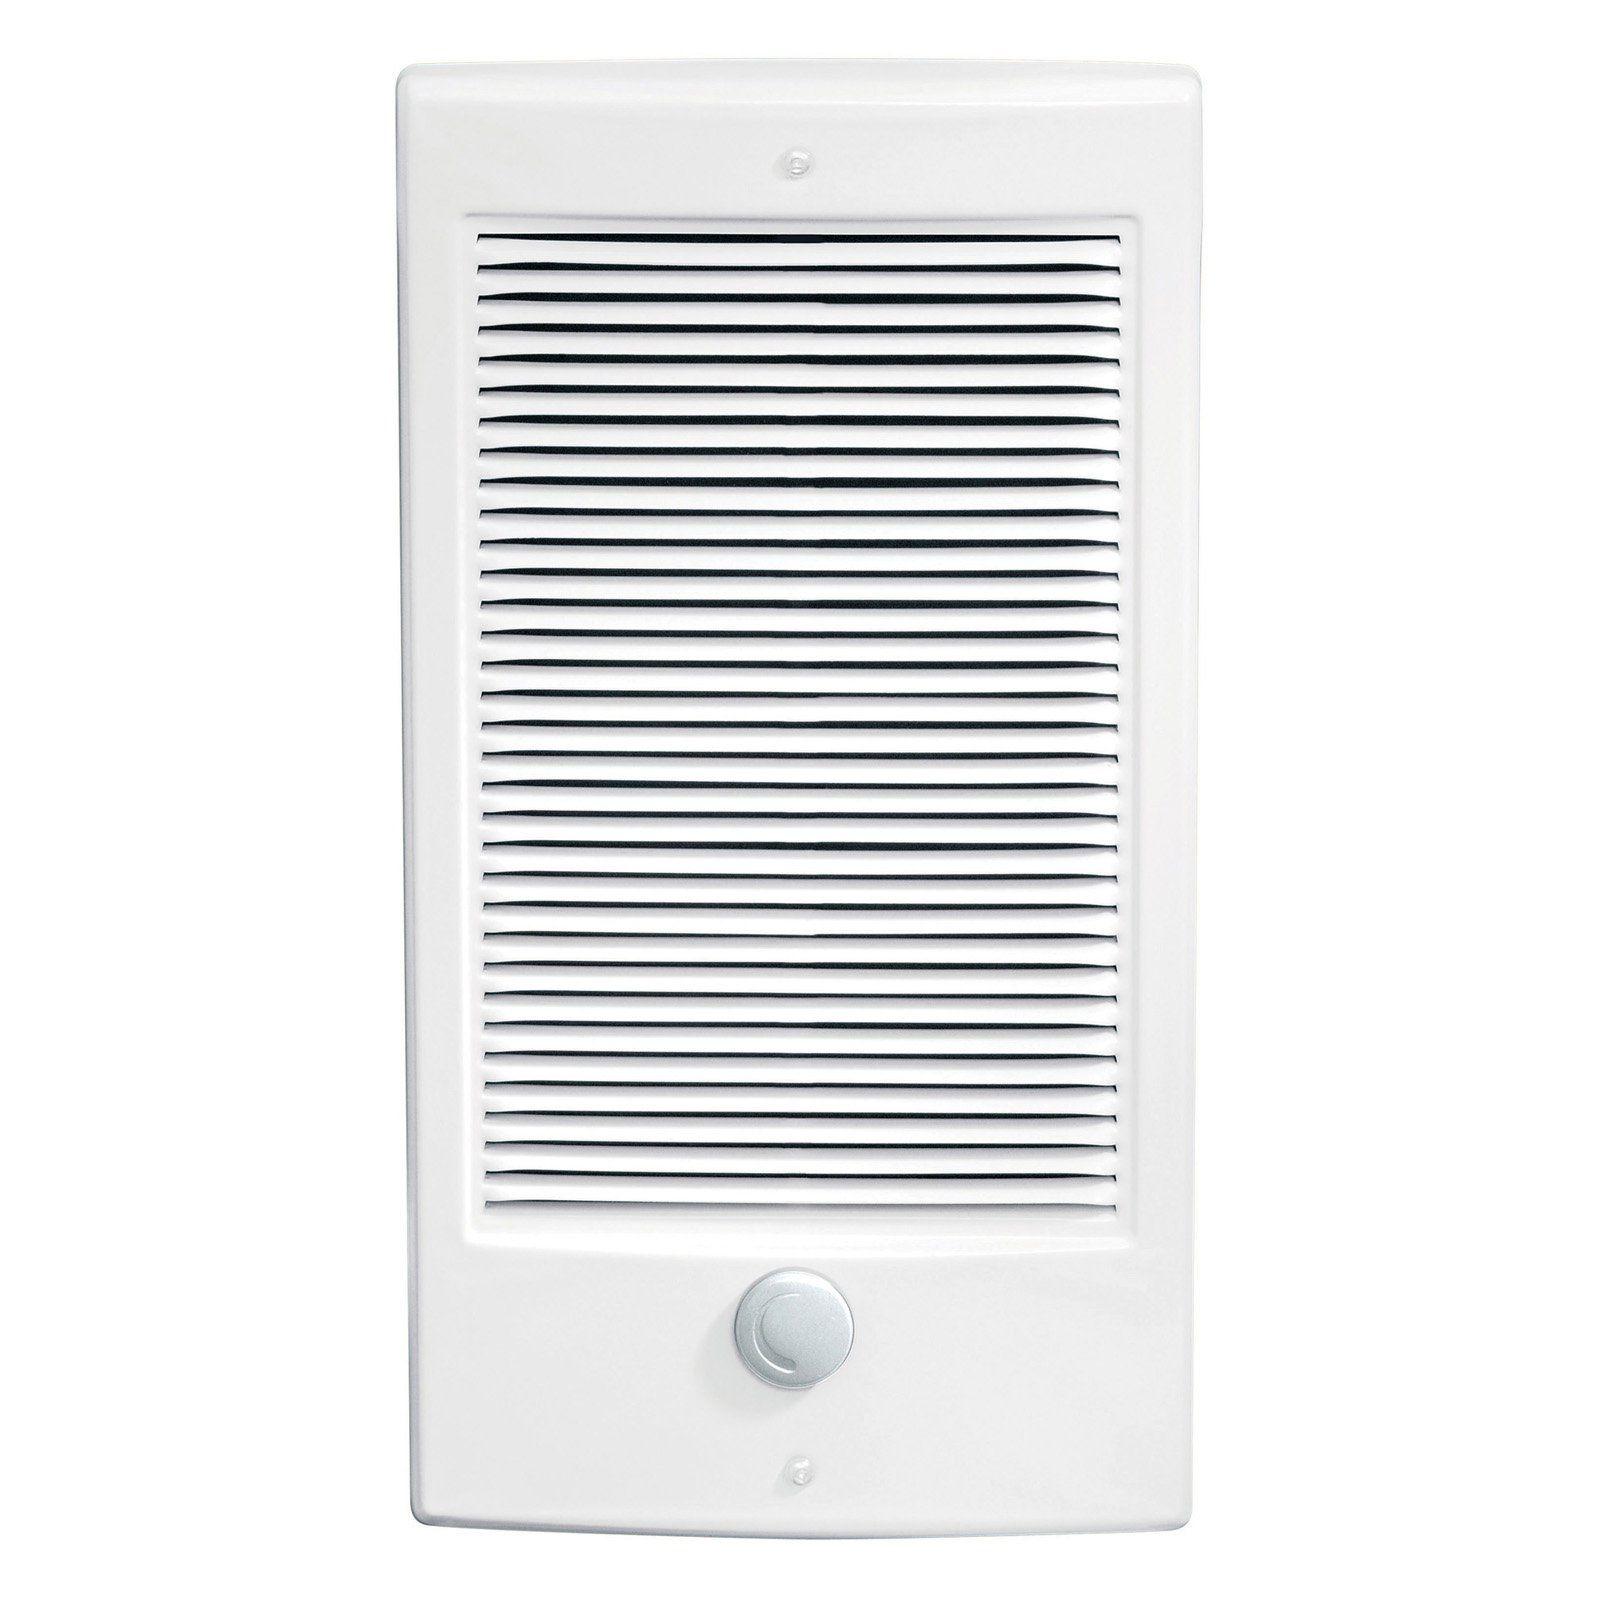 Dimplex TWH Fan Forced Wall Heater Thermostat Kit TWHT1